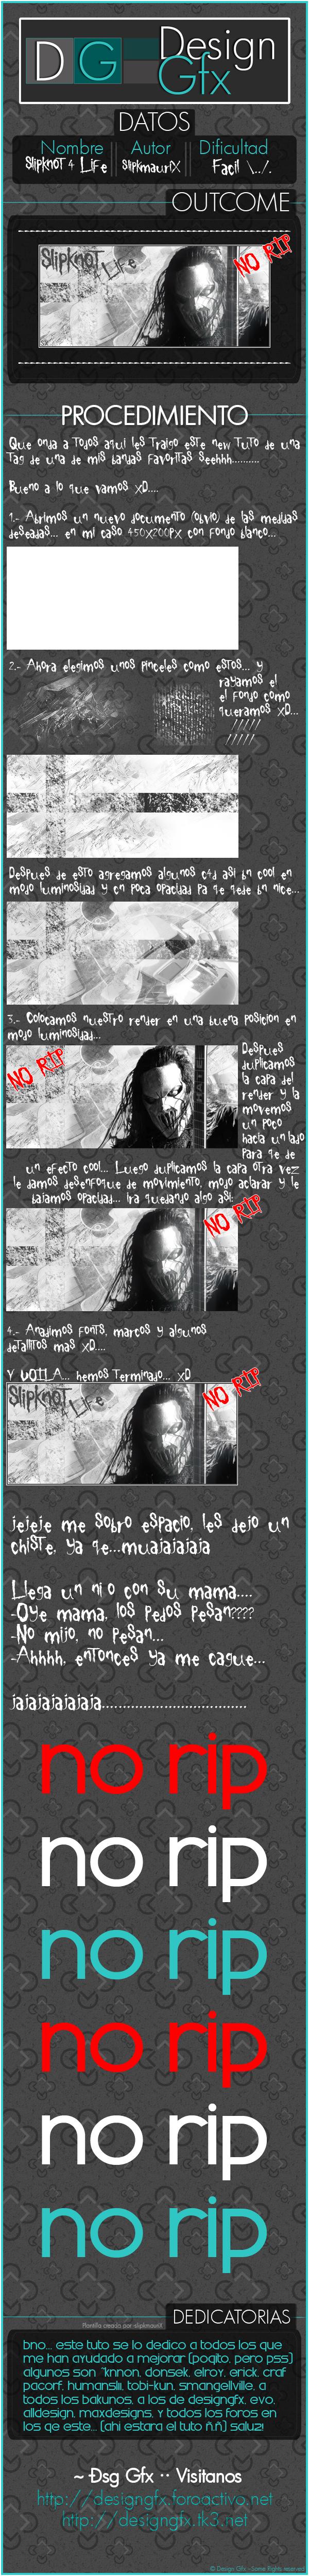 SlipKnoT 4 Life Tut! Slipknot_4_Life___Tutorial_by_slipkmauriX